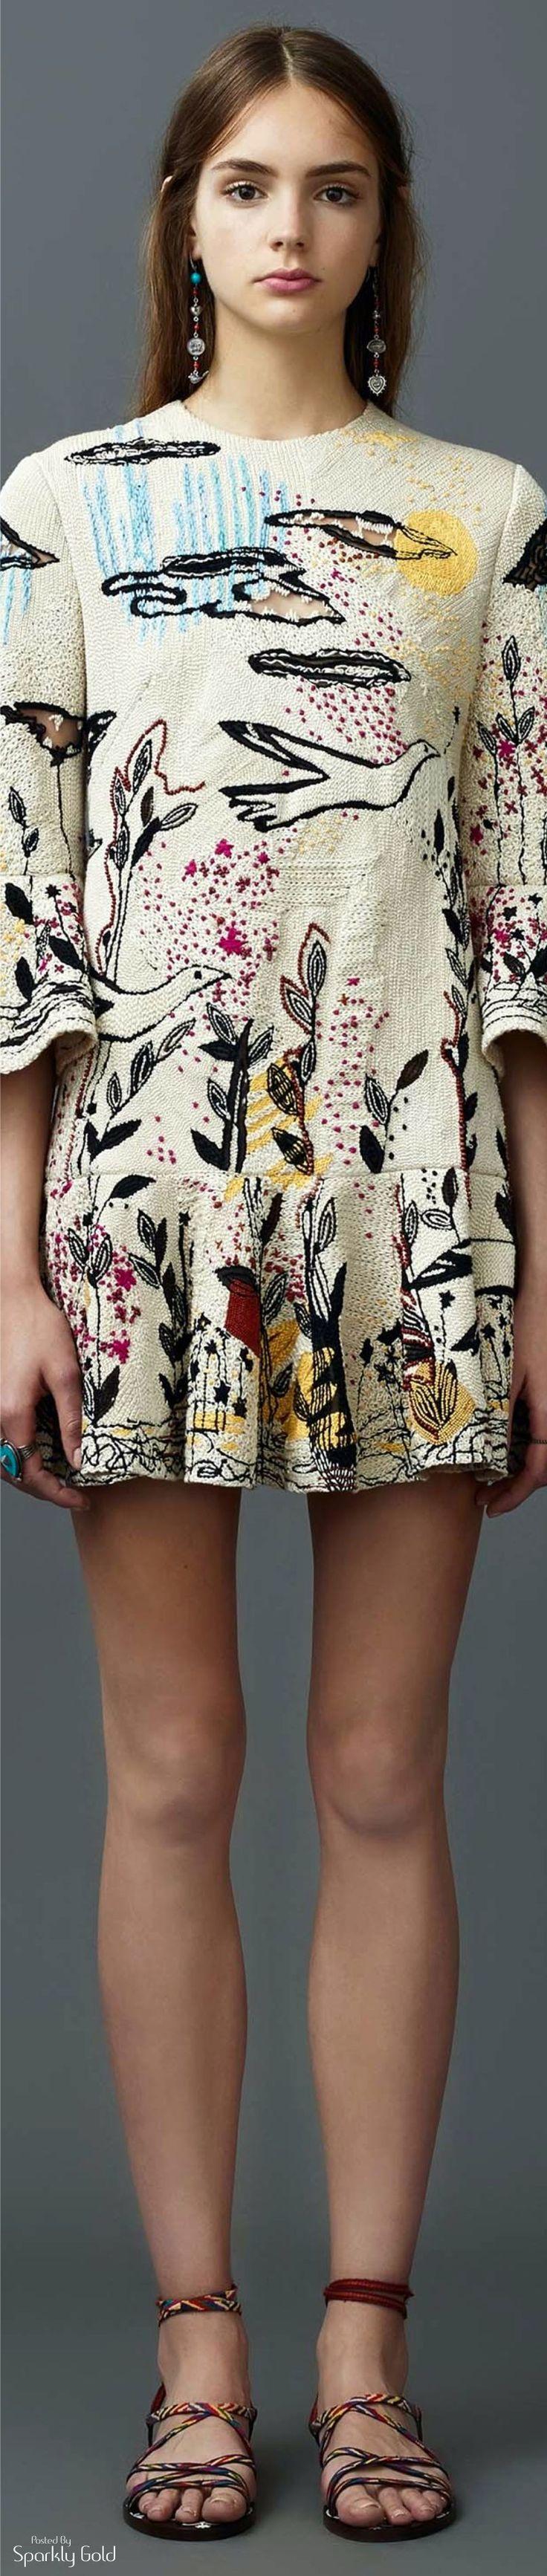 best fashion valentino images on pinterest